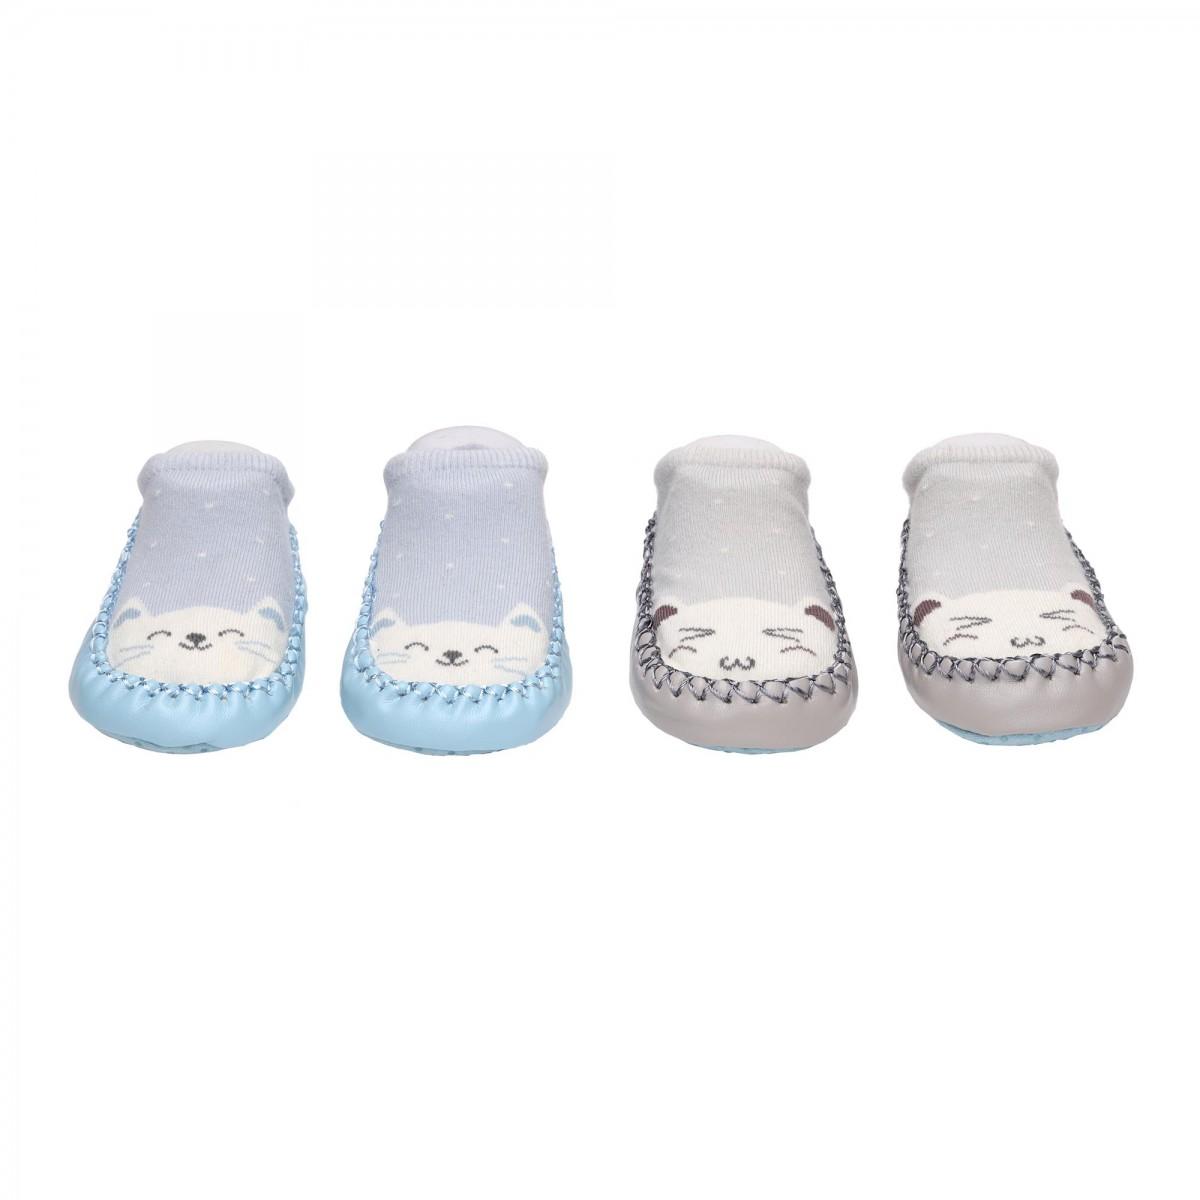 Smiling Shining Blue & Grey Booties - 2 Pack